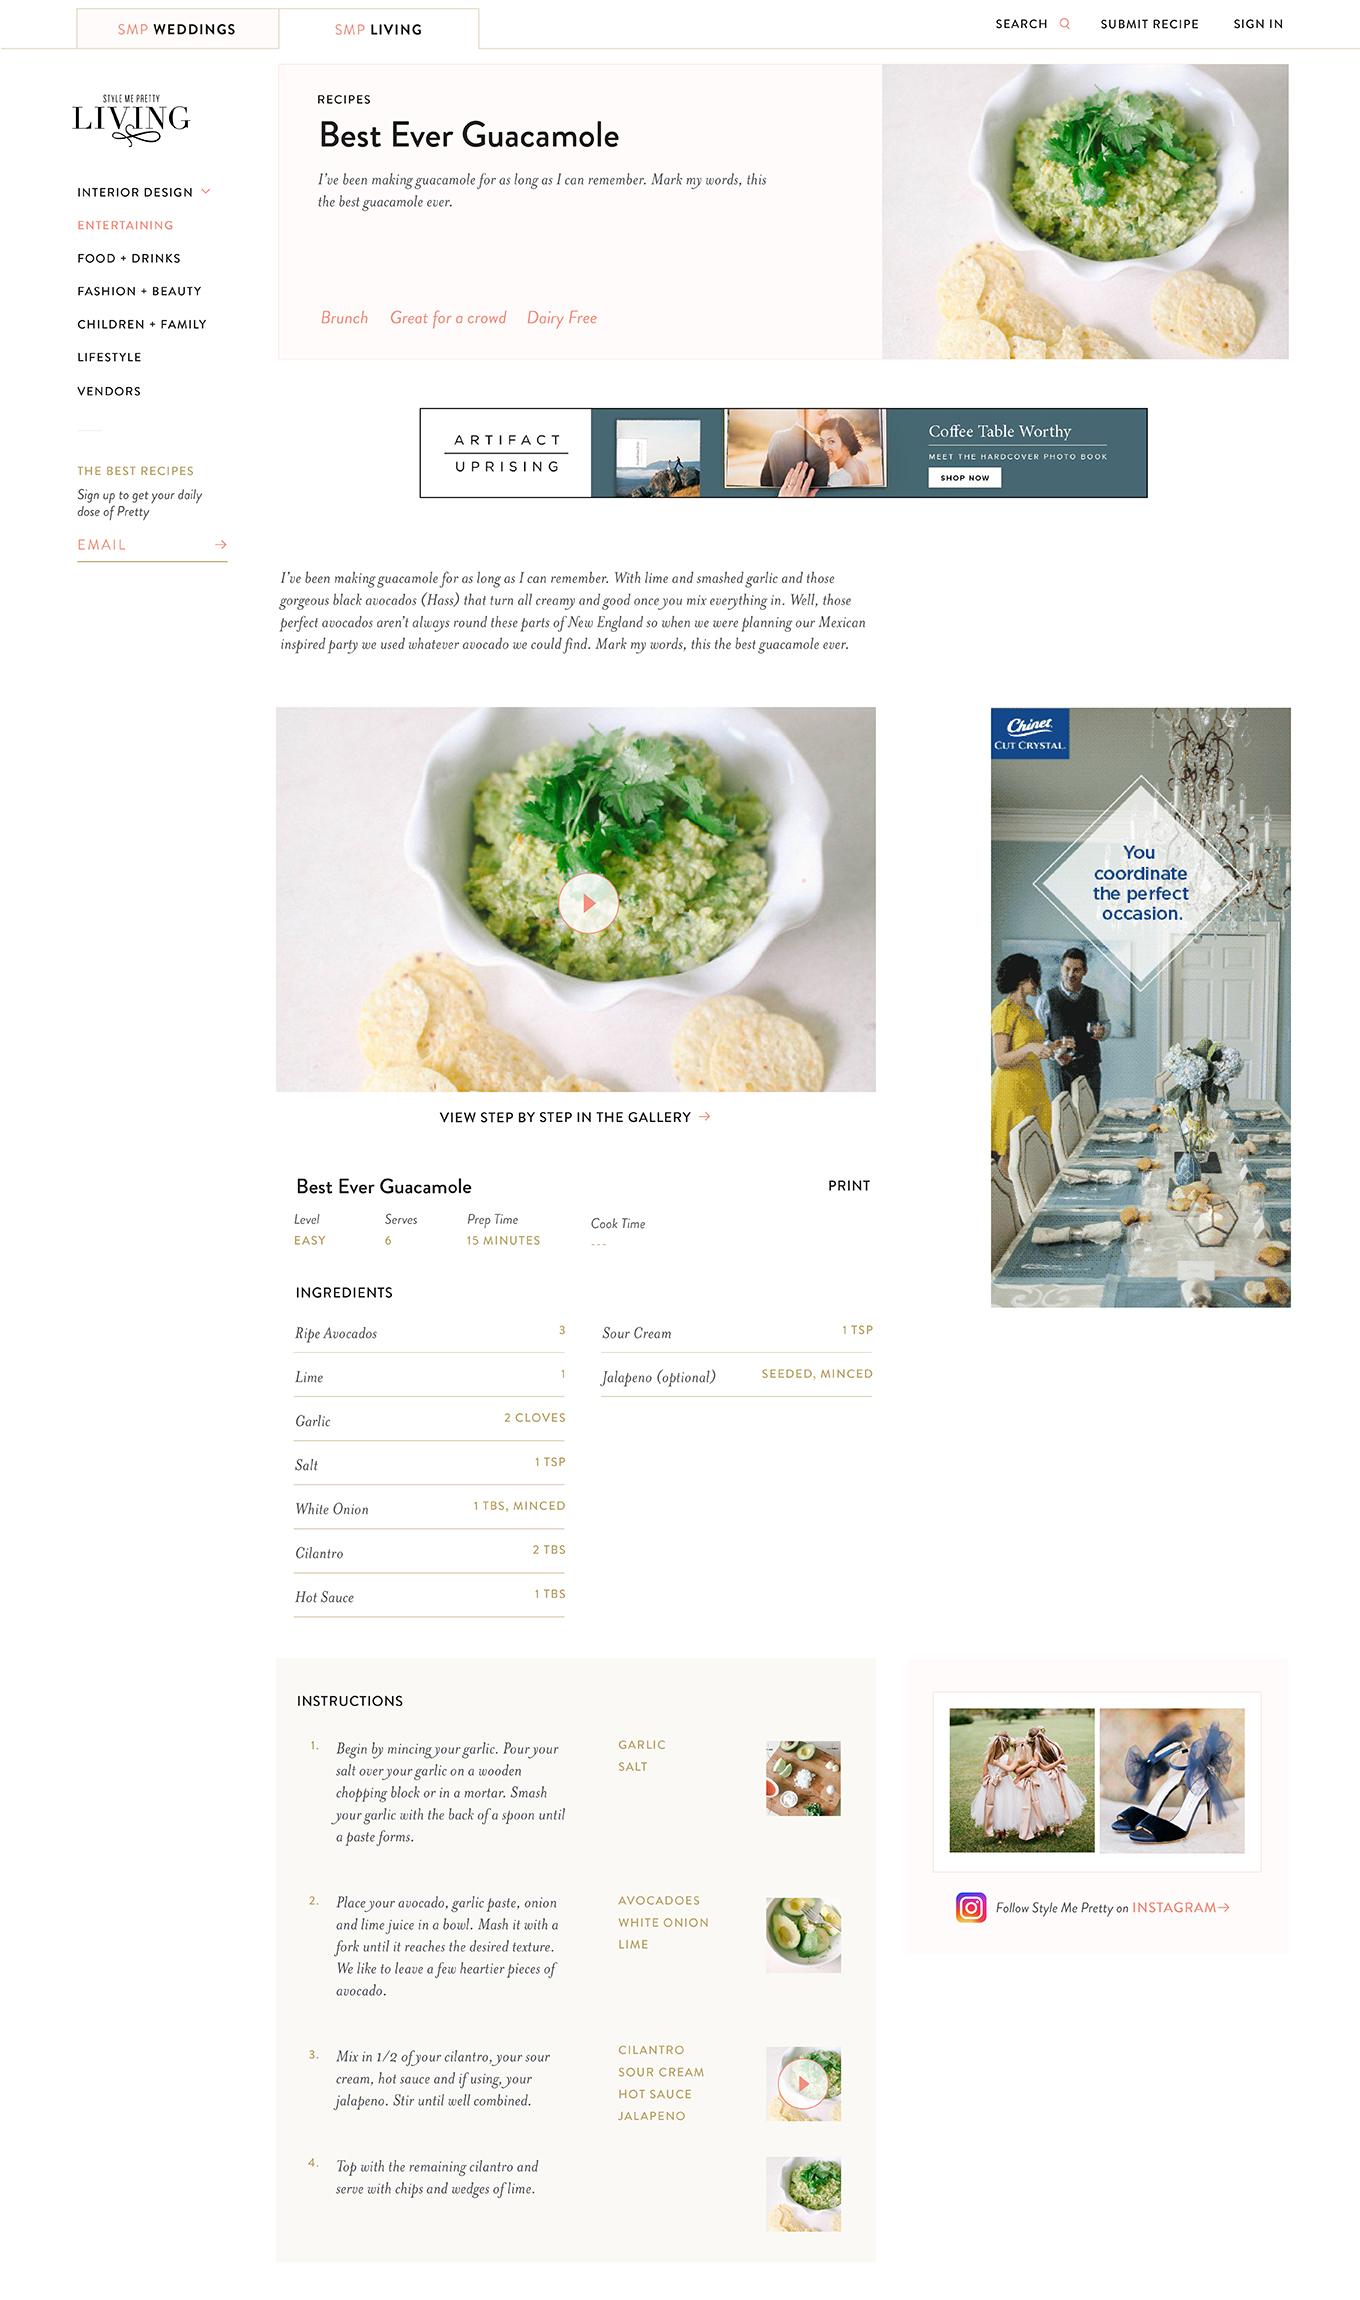 jenniferha_SMP_recipes.jpg